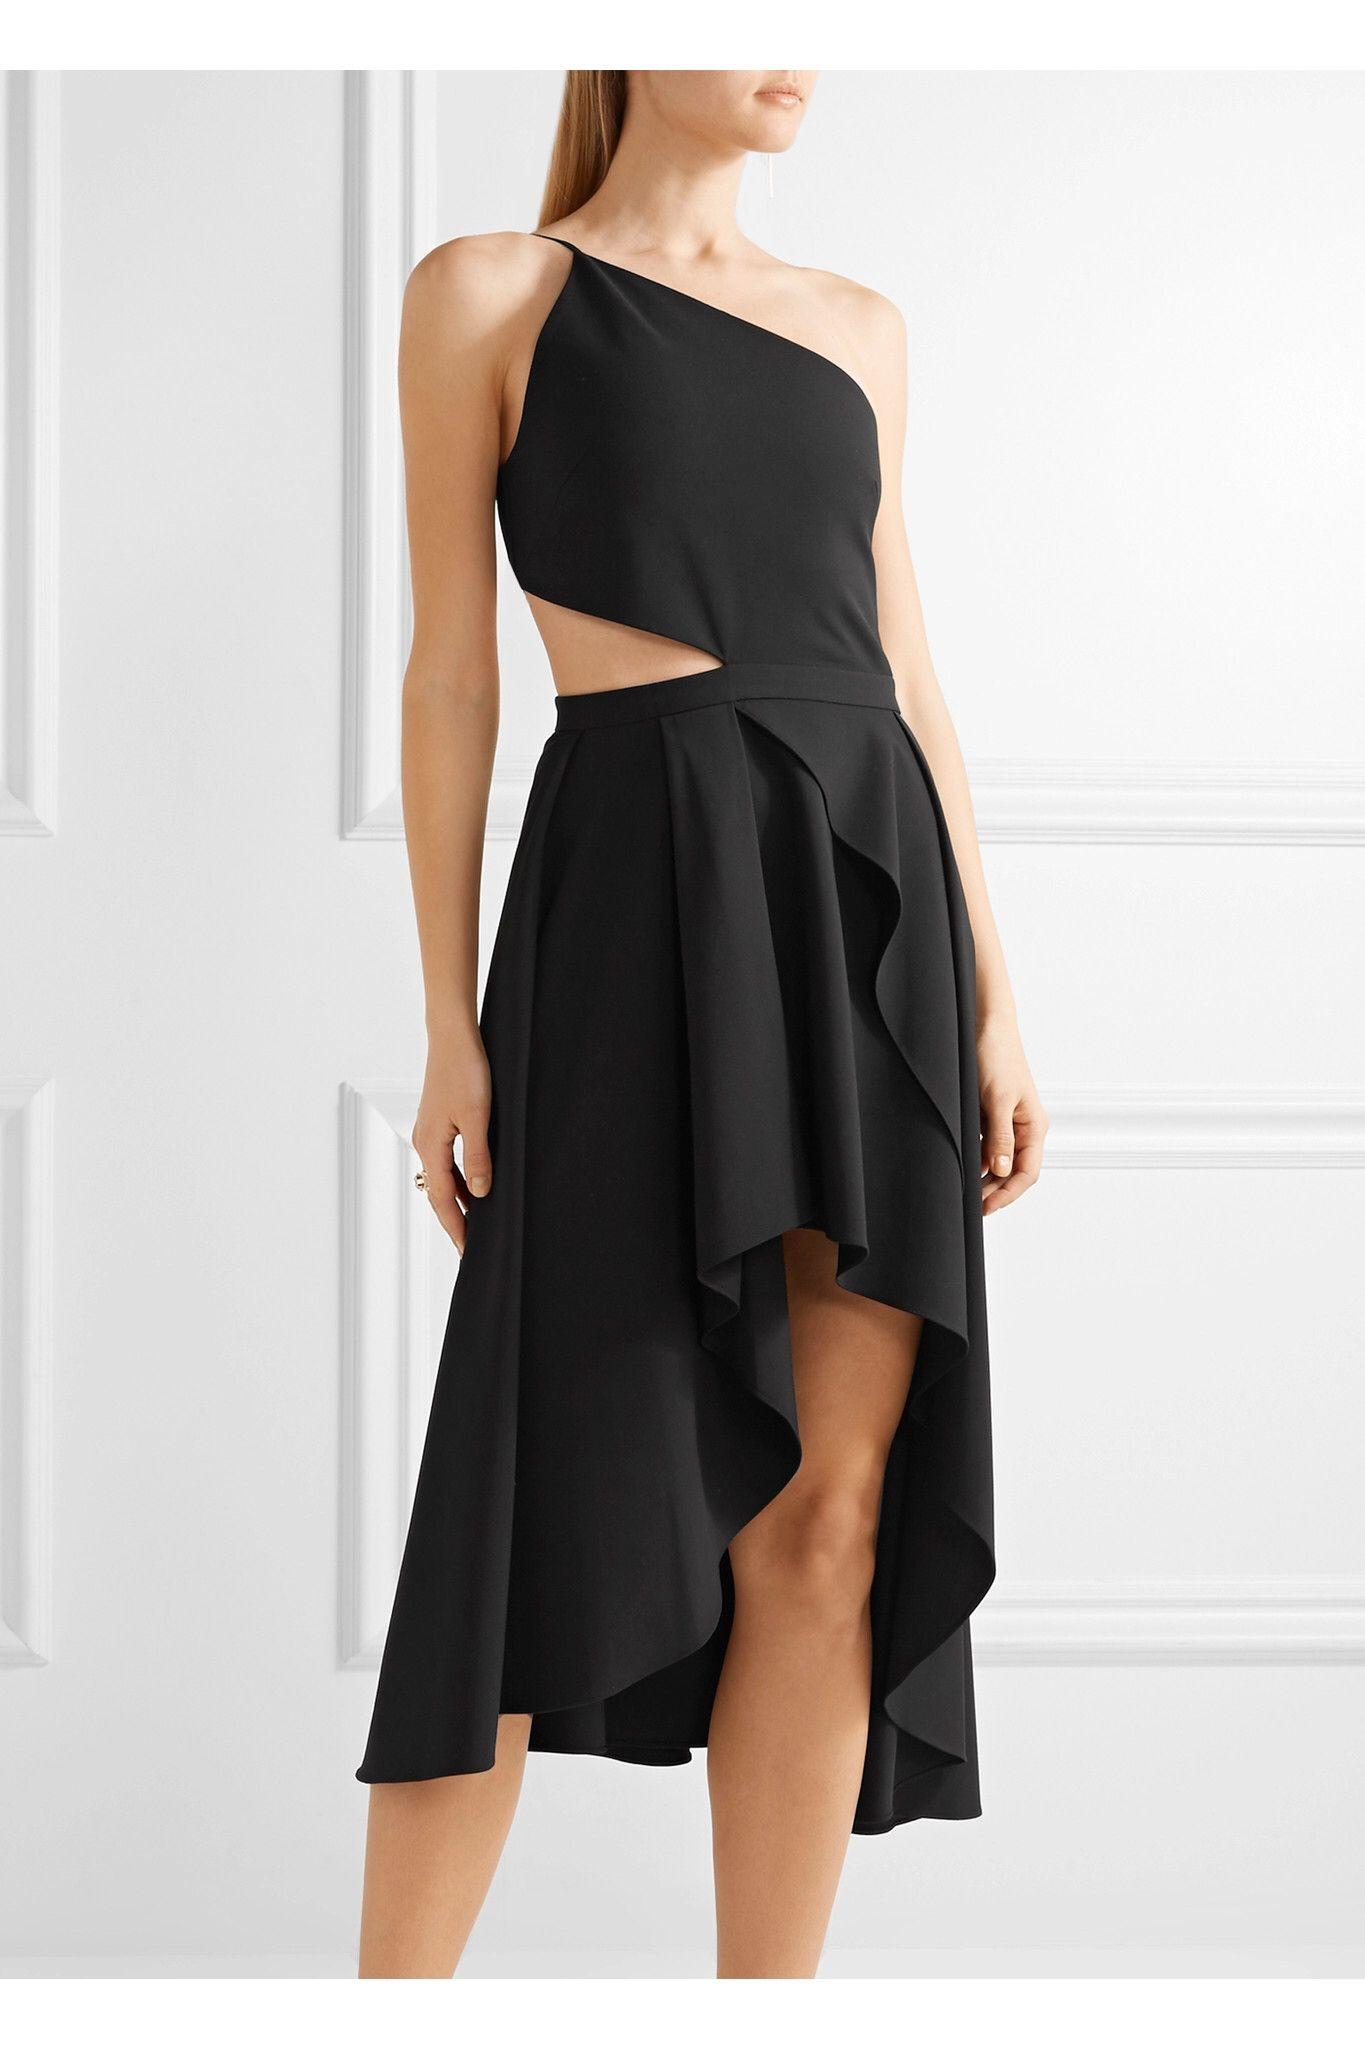 Shoulder · Net-A-Porter Michele Mason cady cutout dress